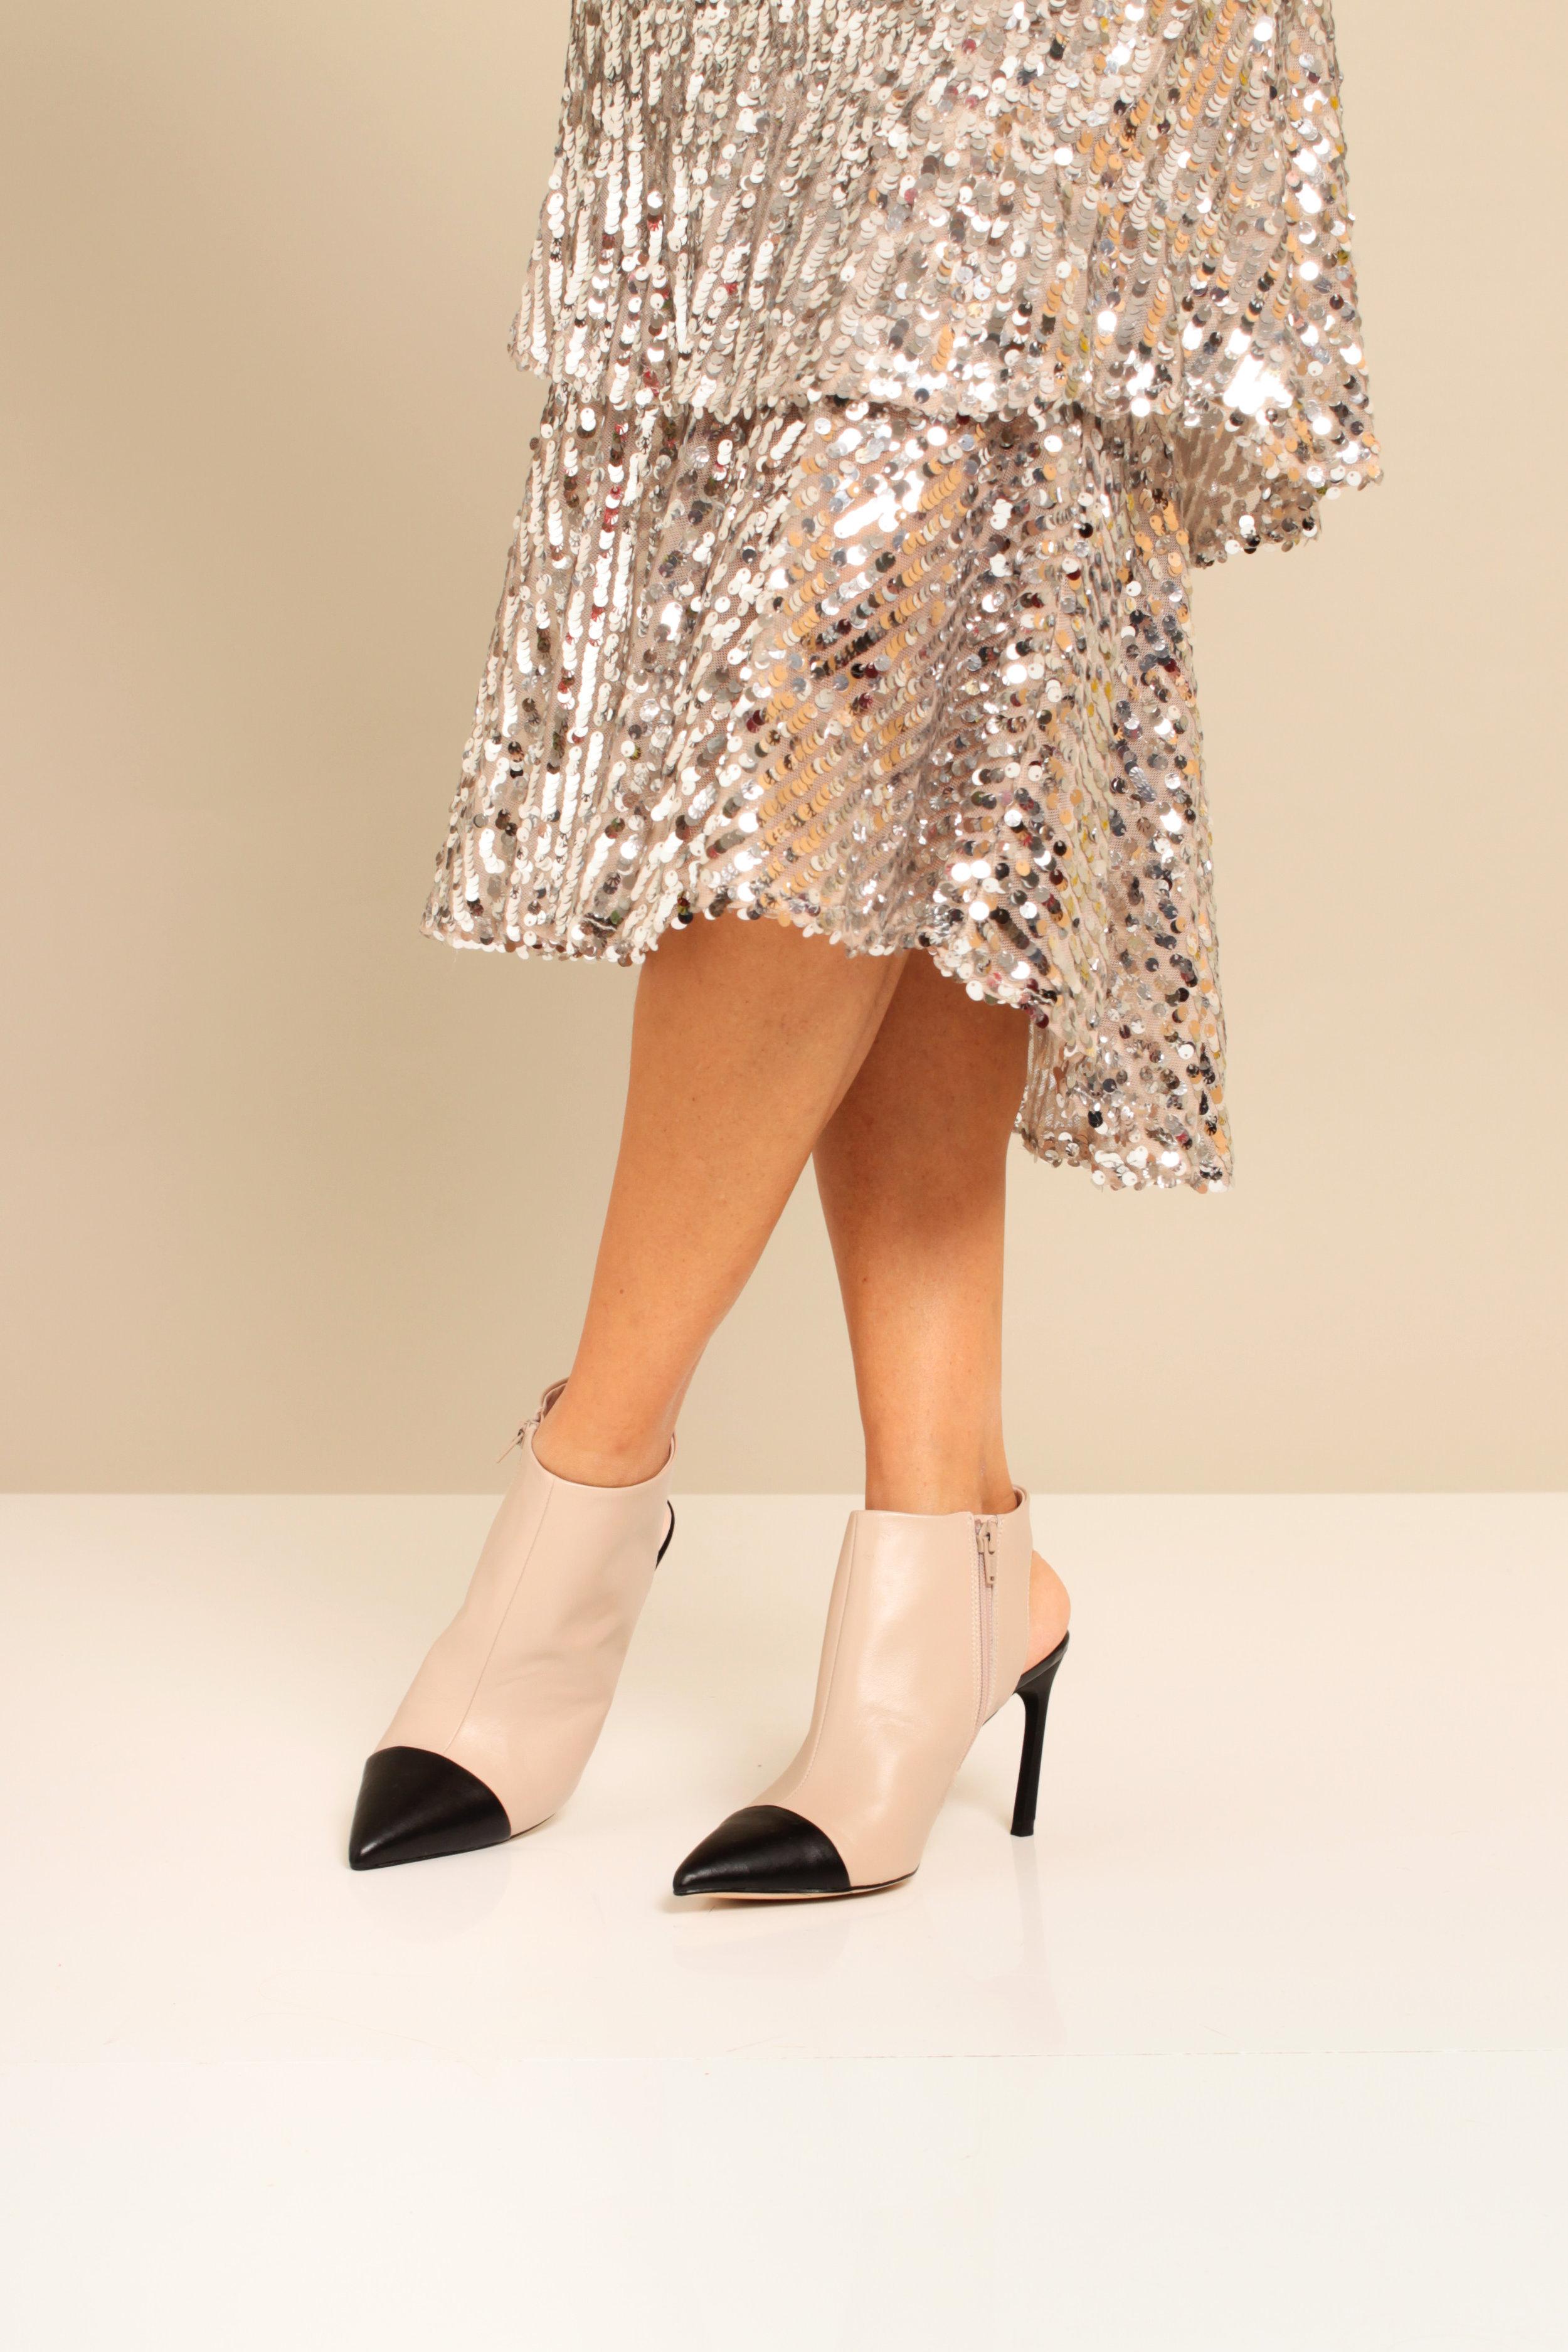 Boots: £79.99  Zara